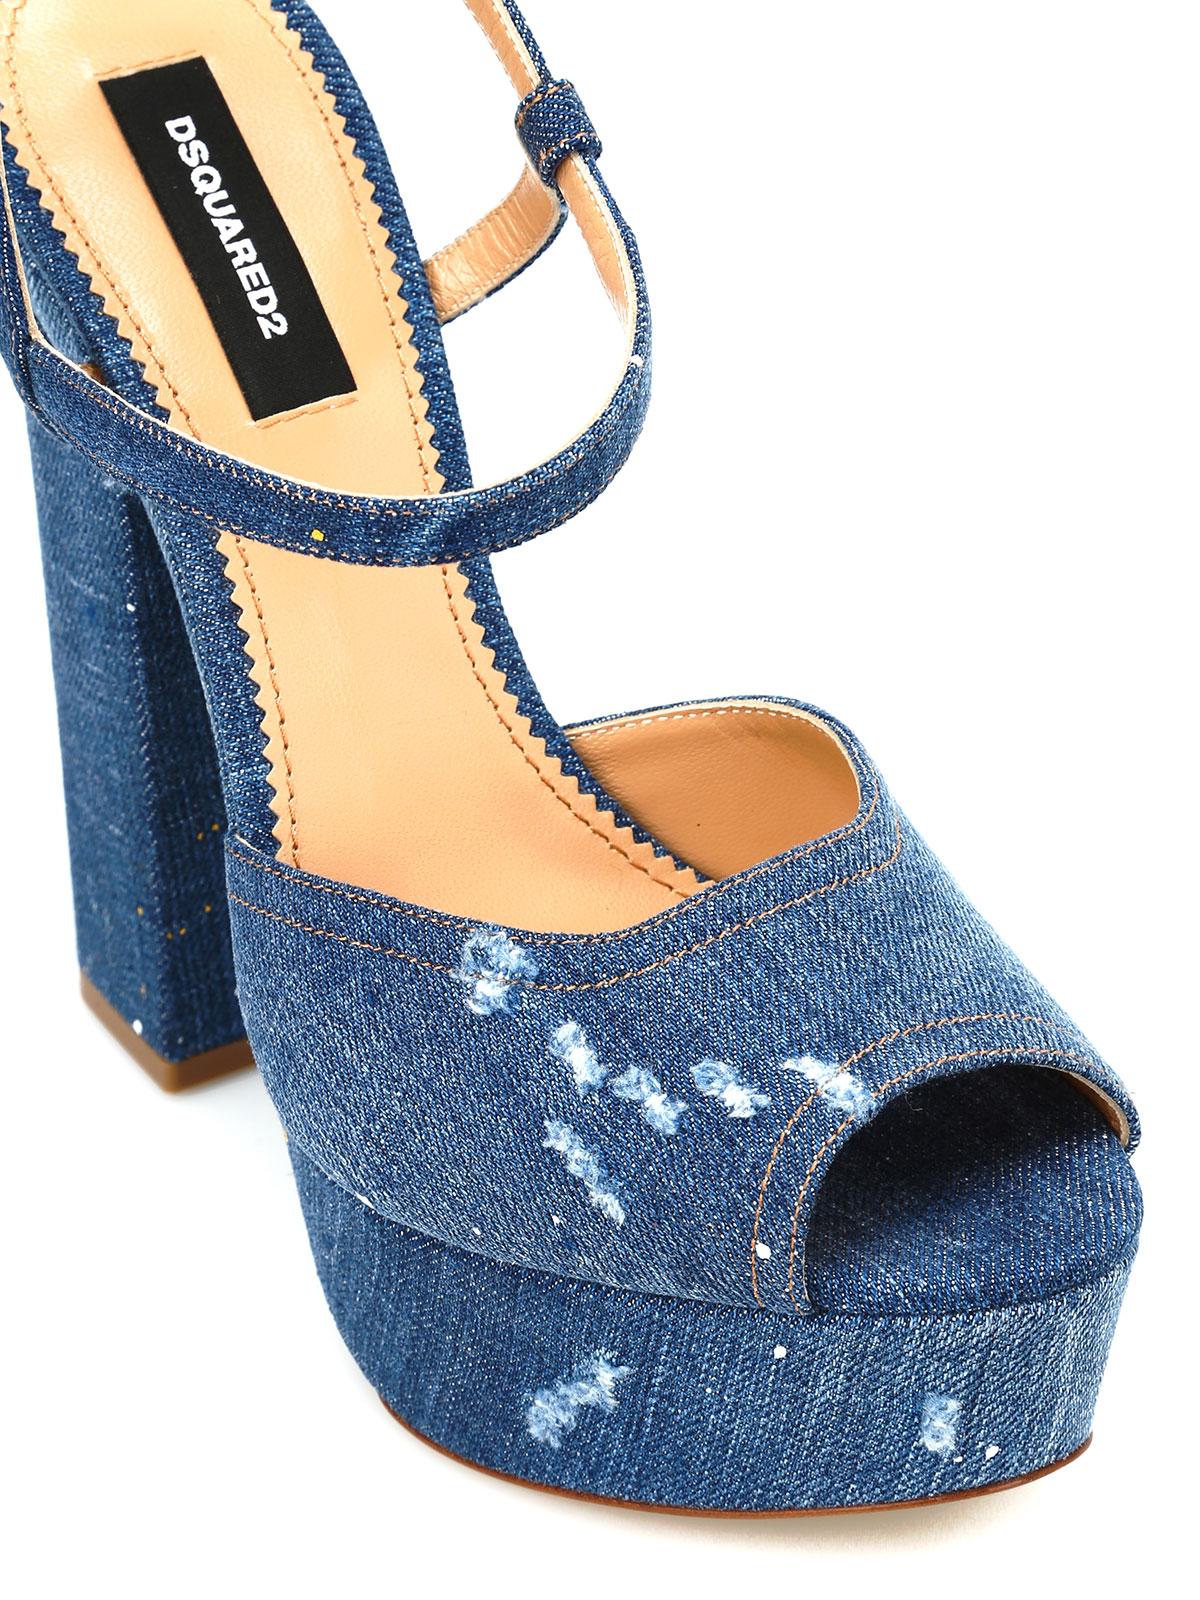 Sandales En Denim Dsquared2 - Bleu 5a8rAfD